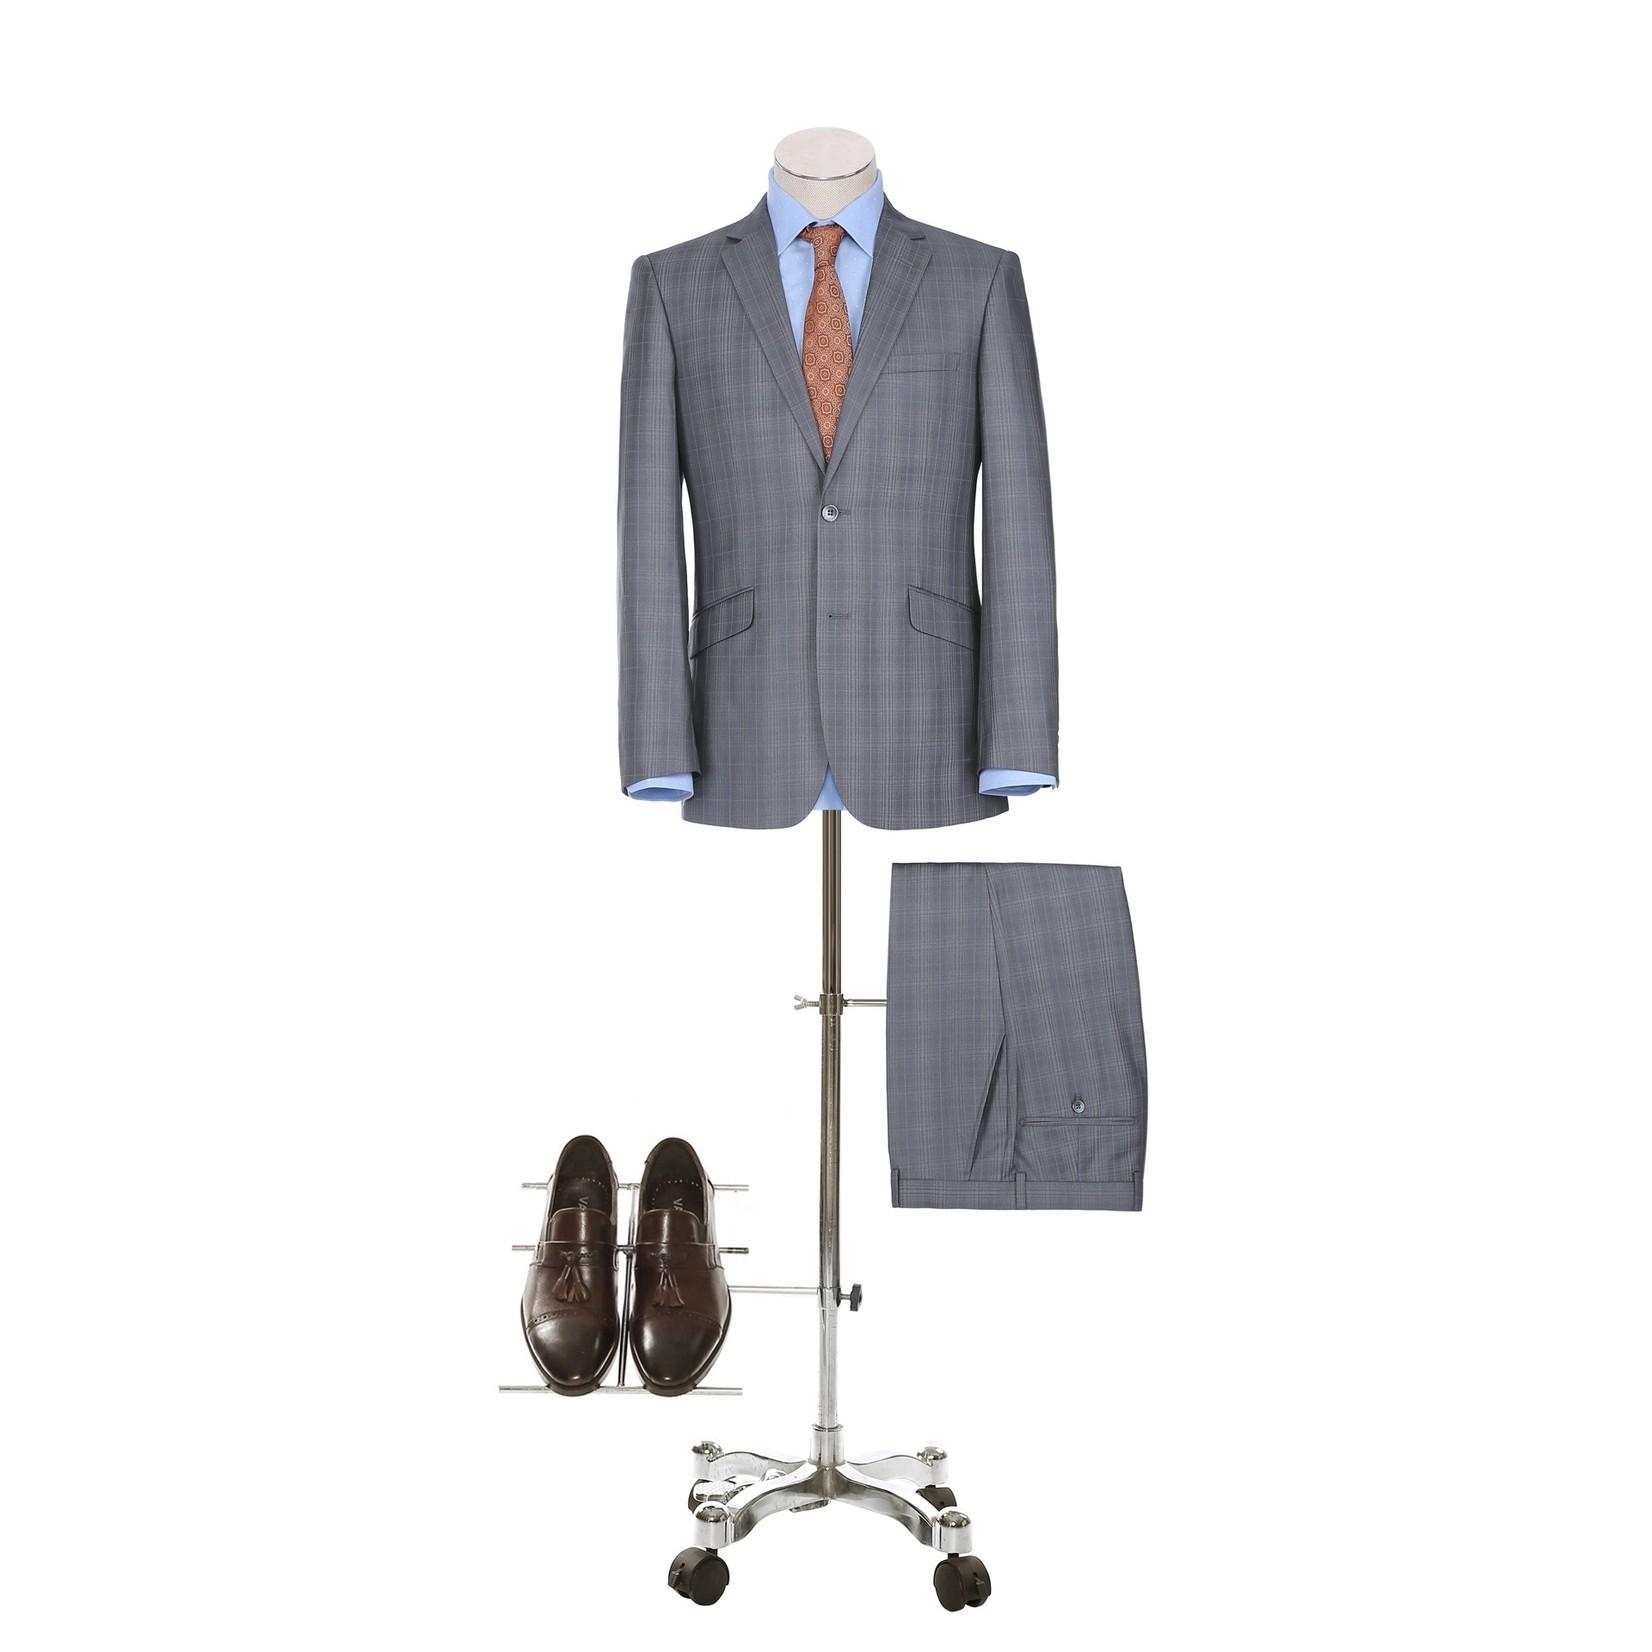 Renoir Renoir Slim Fit Suit 291-2 Grey Plaid